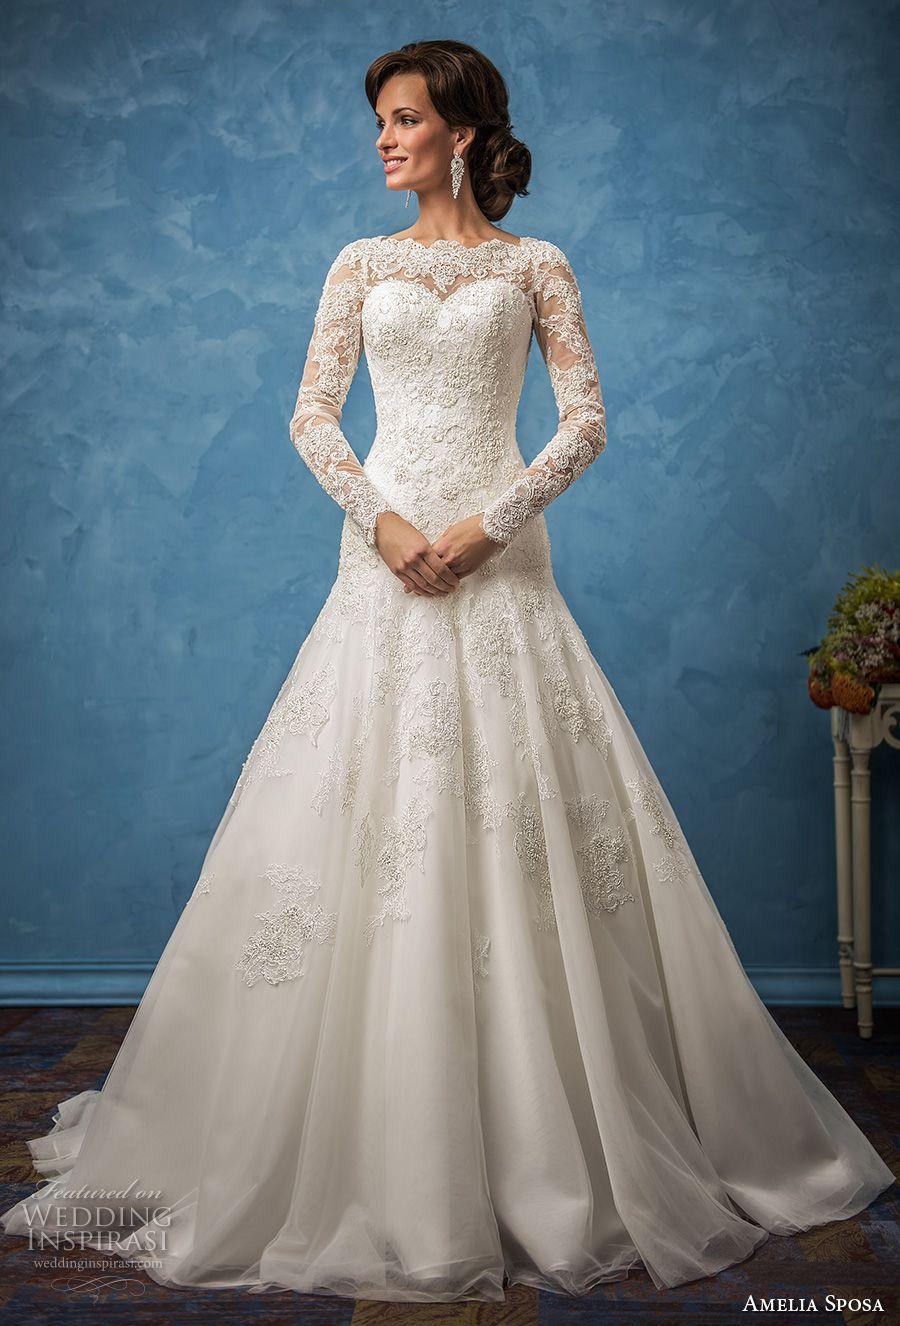 Amelia sposa wedding dresses u ucroyal blueud bridal collection